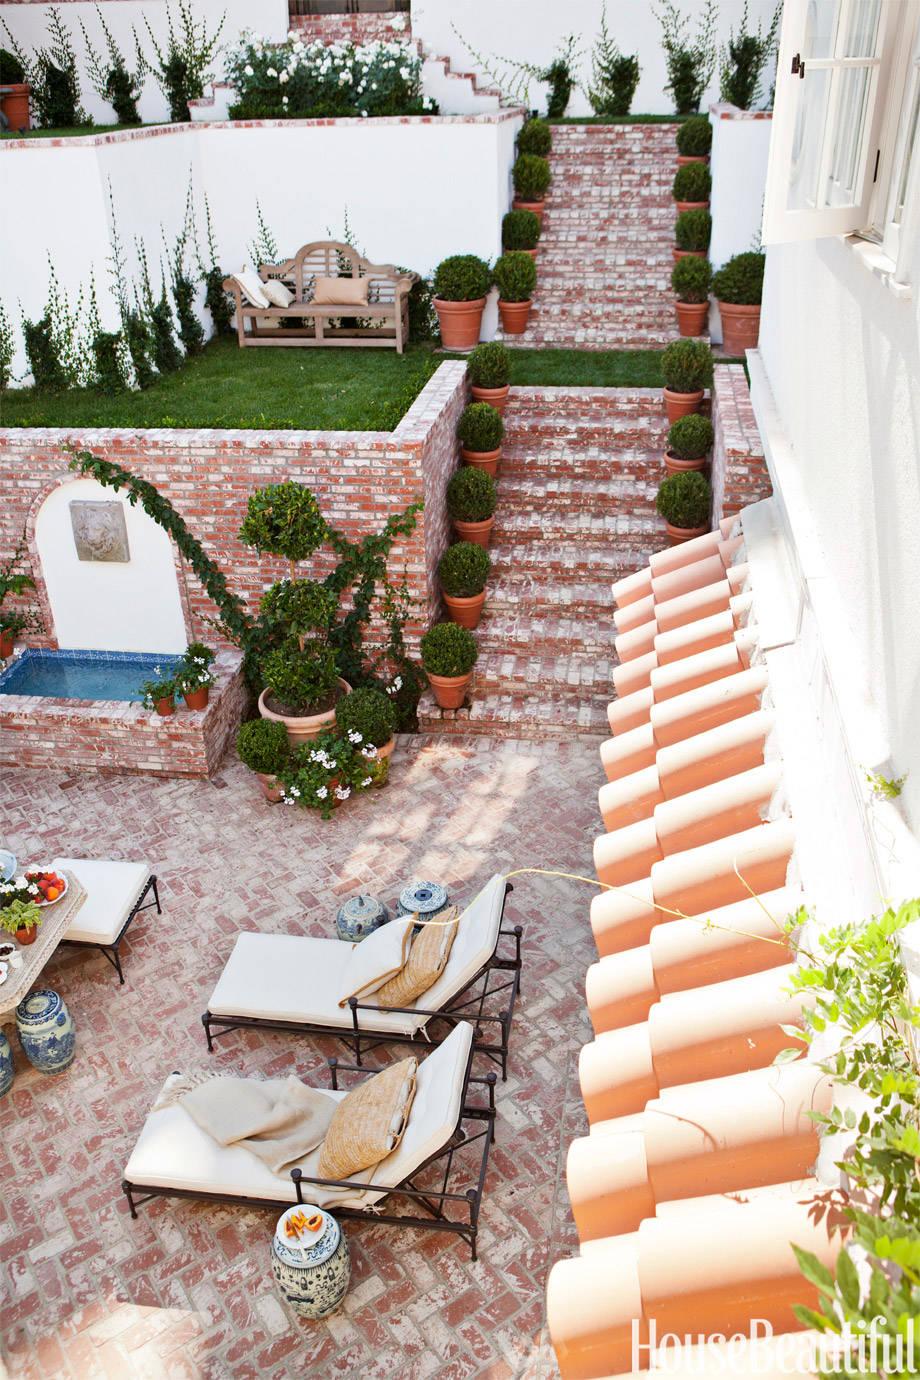 Wondrous 30 Backyard Design Ideas Beautiful Yard Inspiration Pictures Inspirational Interior Design Netriciaus